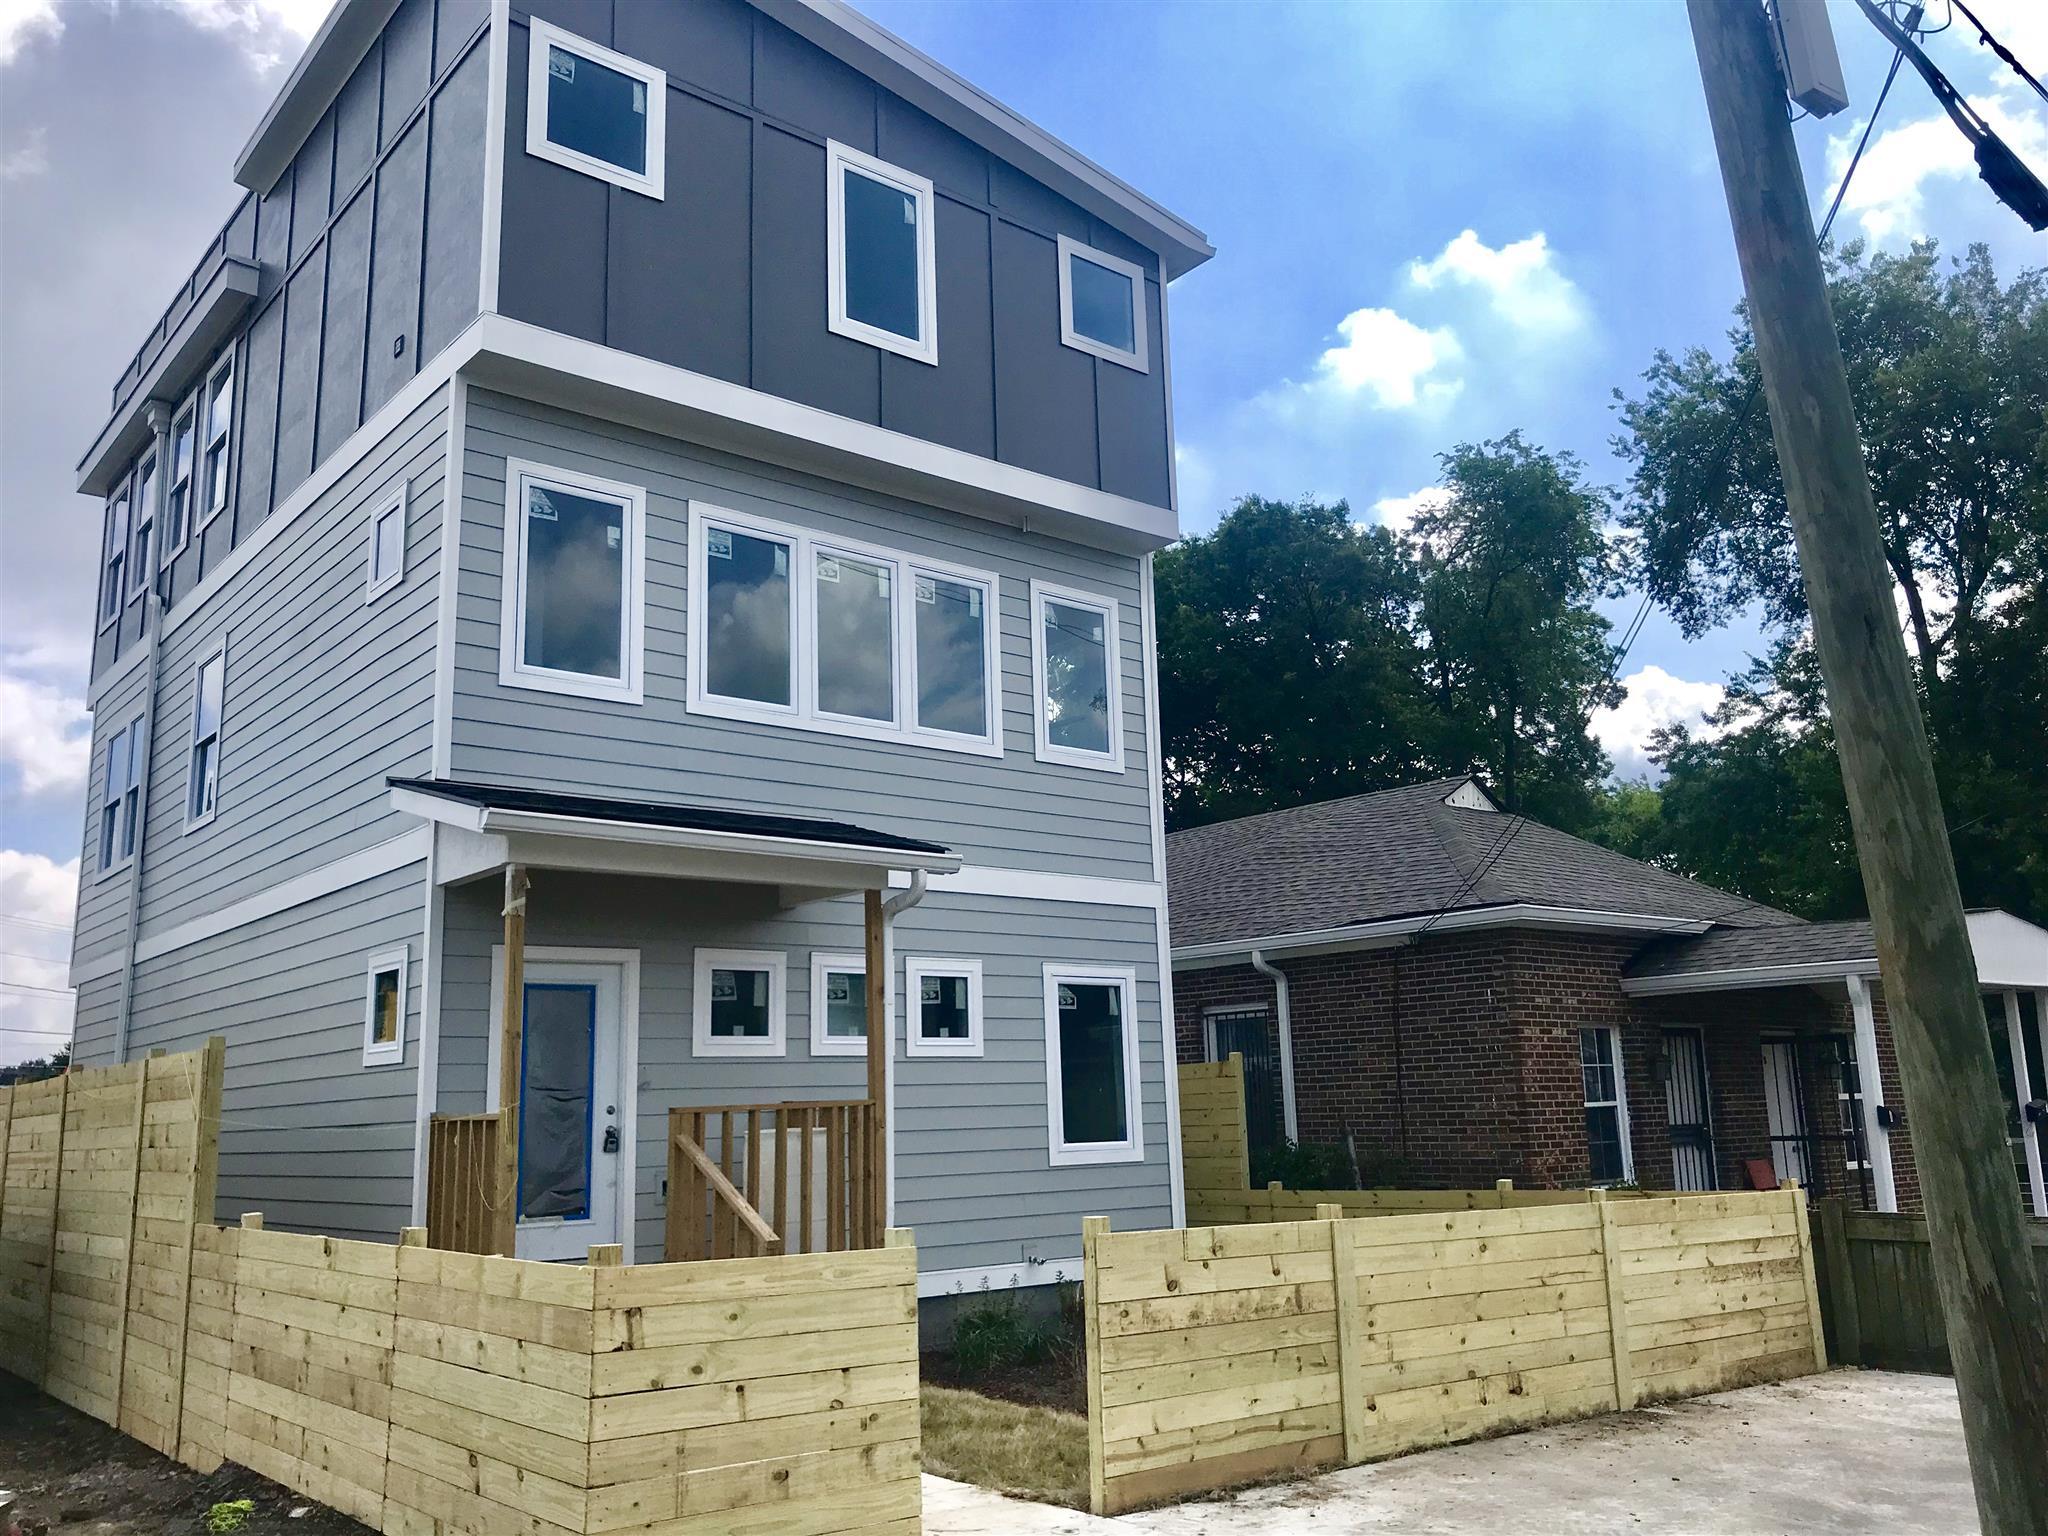 1008 2Nd Ave S, Nashville, TN 37210 - Nashville, TN real estate listing